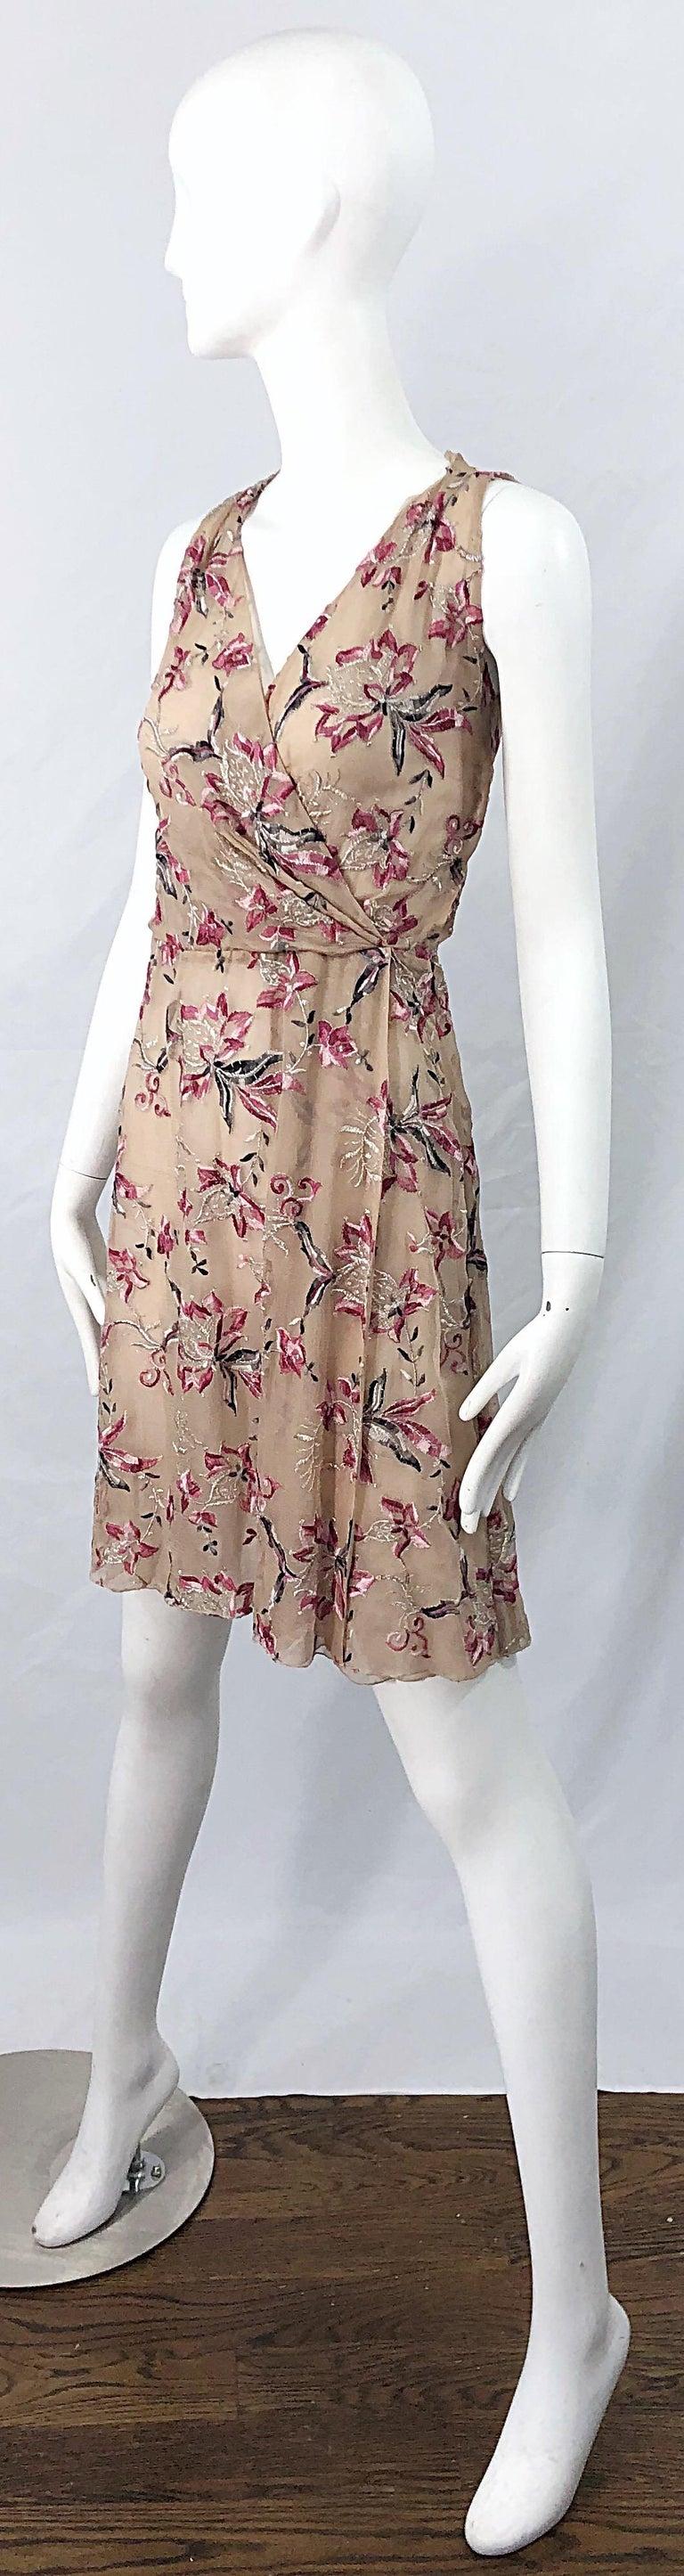 Beautiful 1990s Valentino Nude Silk Chiffon Semi Sheer Size 6 Embroidered Dress For Sale 1